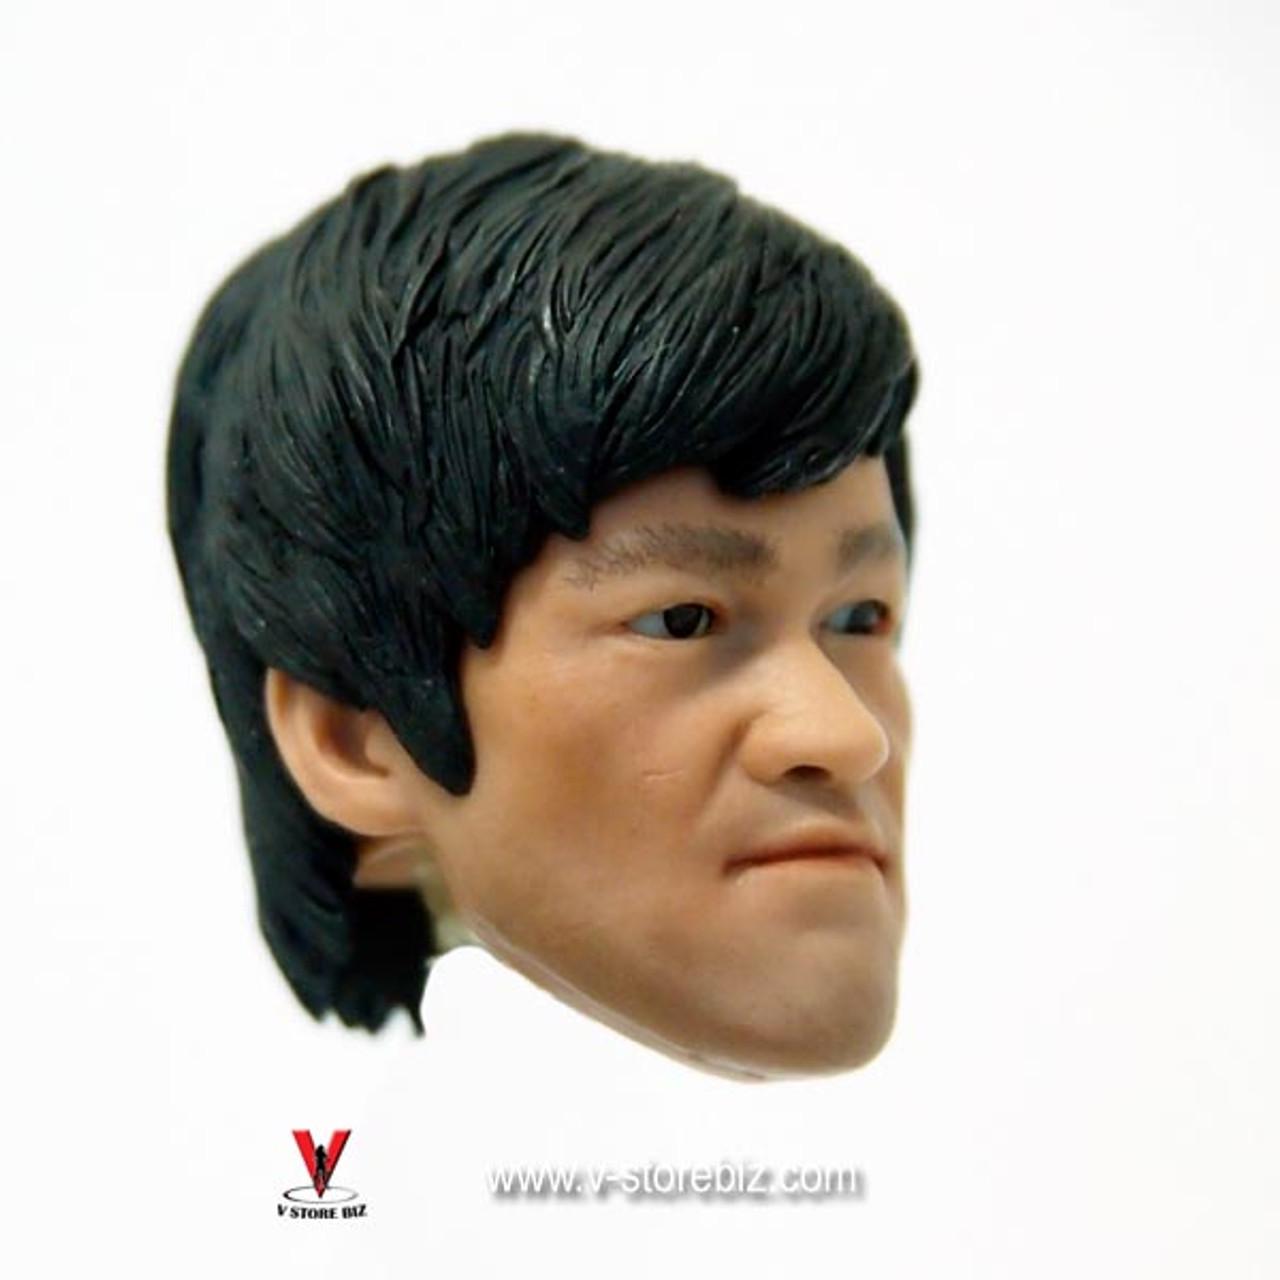 "303TOYS 1//6 Scale Bruce Lee Head Sculpt for 12/"" Action Figure"